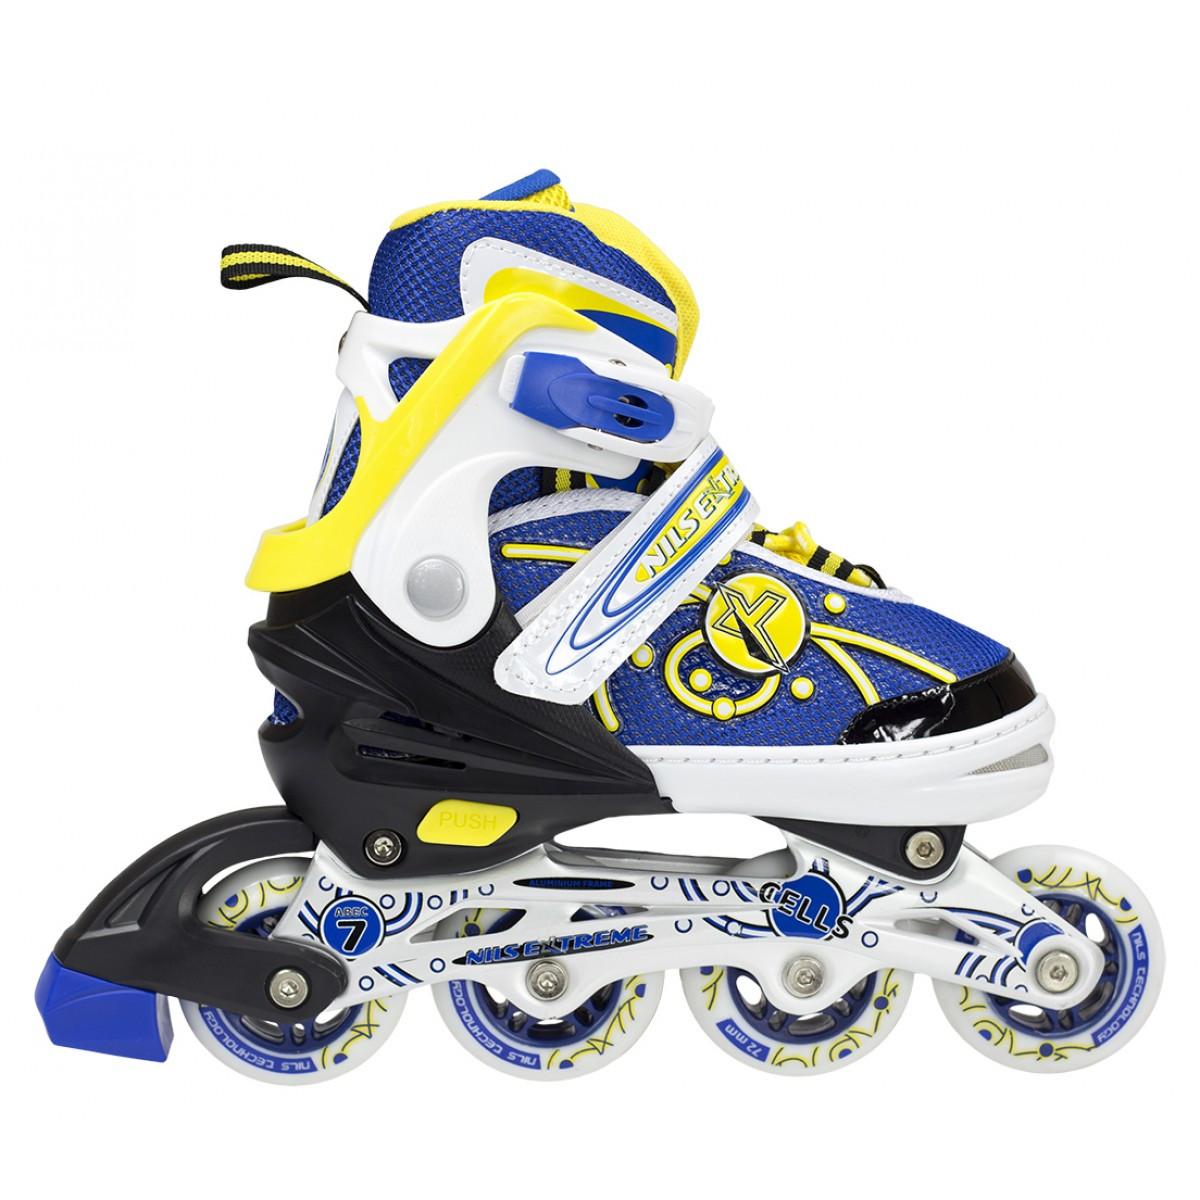 Роликовые коньки Nils Extreme NA1152A Size 35-38 Yellow